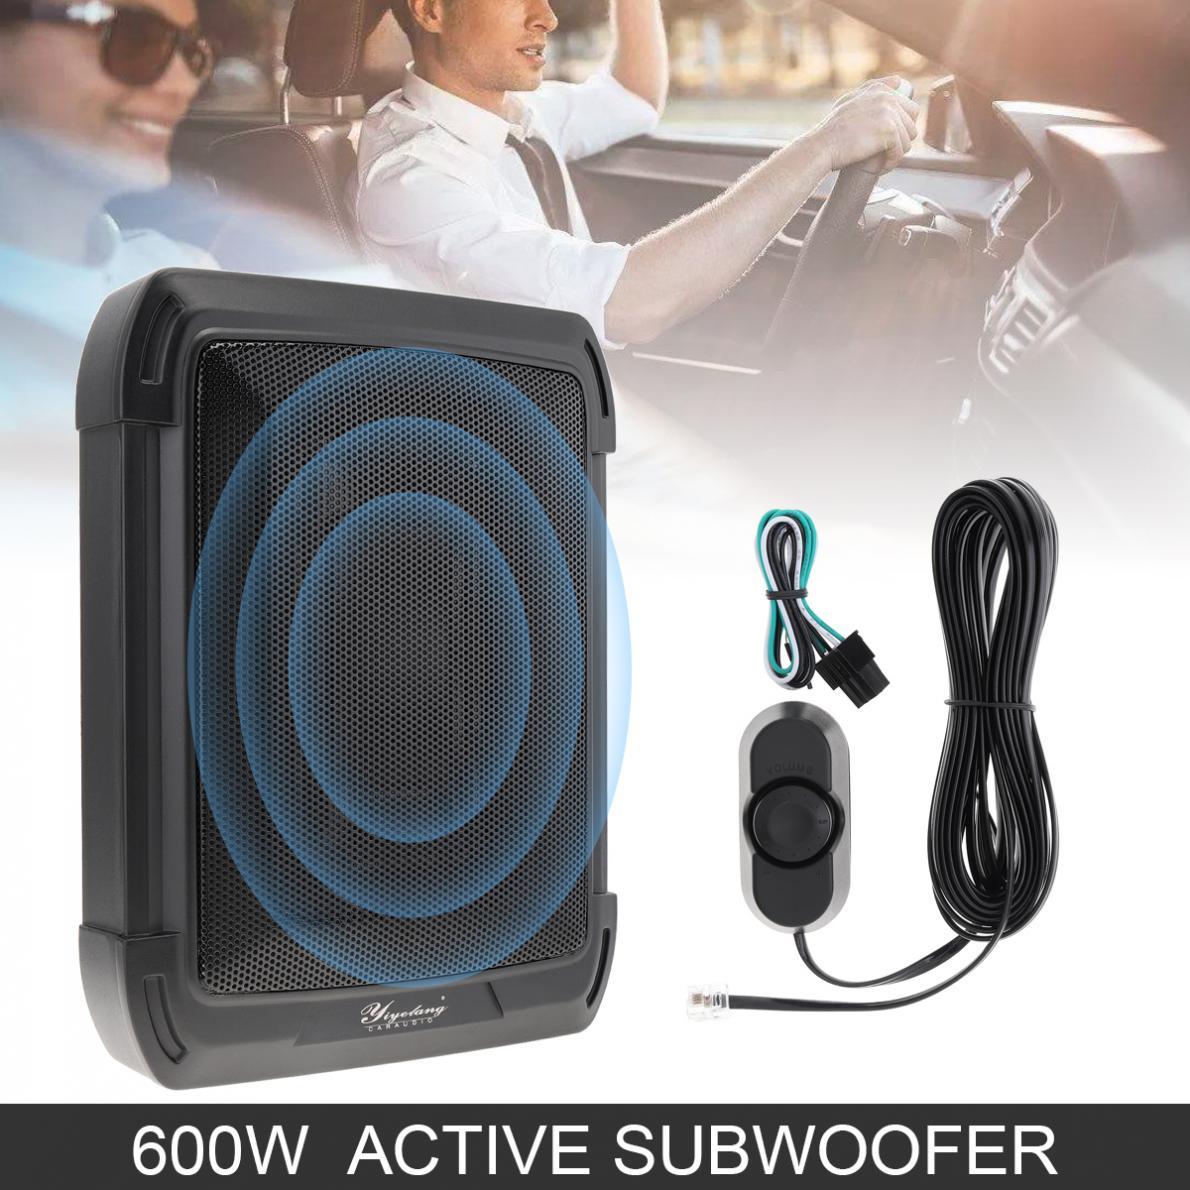 10 Inch 600W Slim Car Audio Active Car Subwoofer Under Seat Speaker Bass Stereo Speaker Low Distortion Amplifier